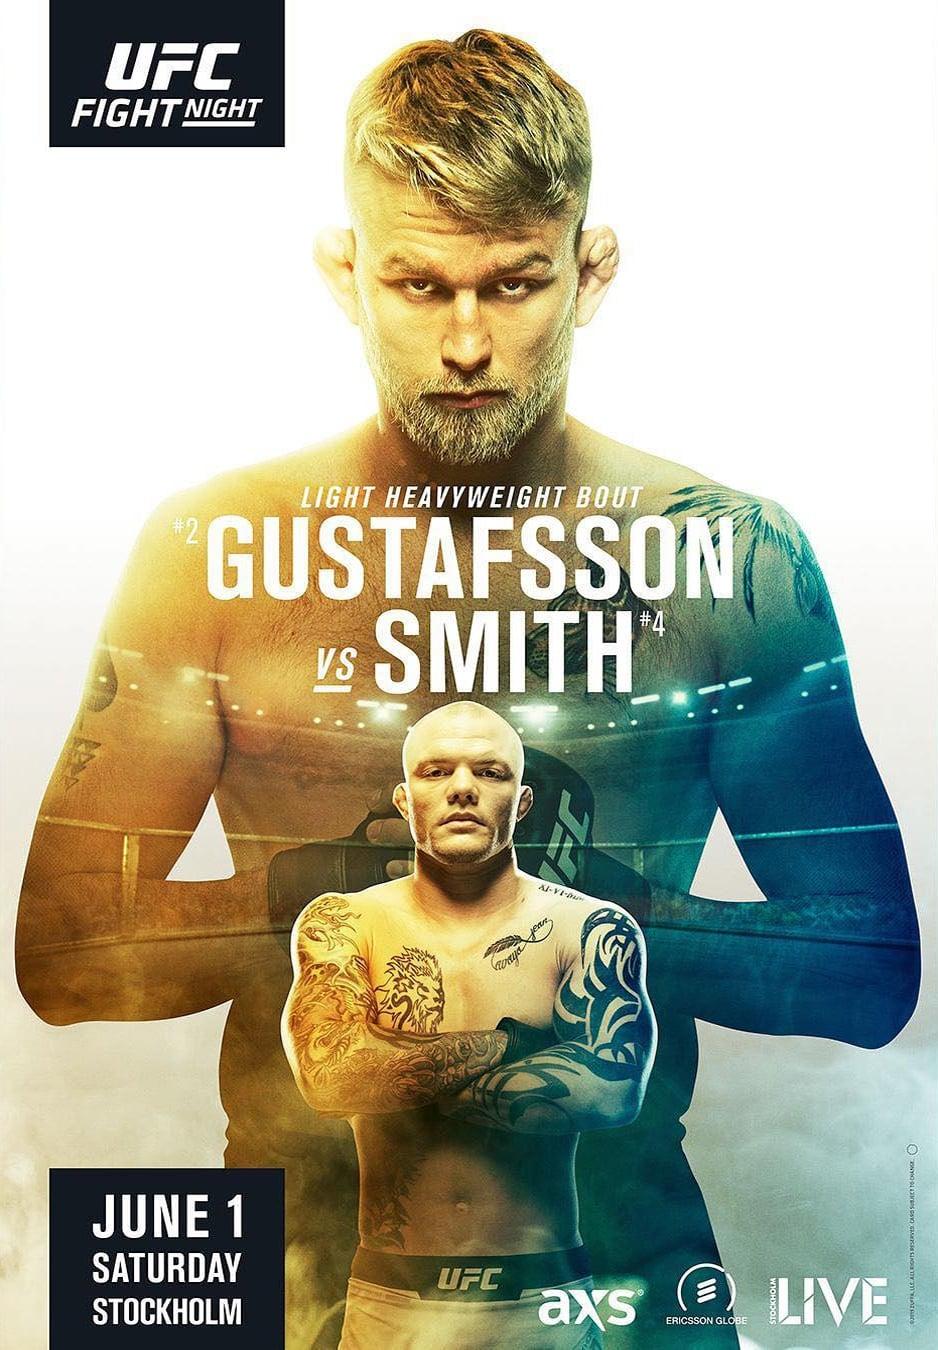 UFC Fight Night 153: Gustafsson vs. Smith